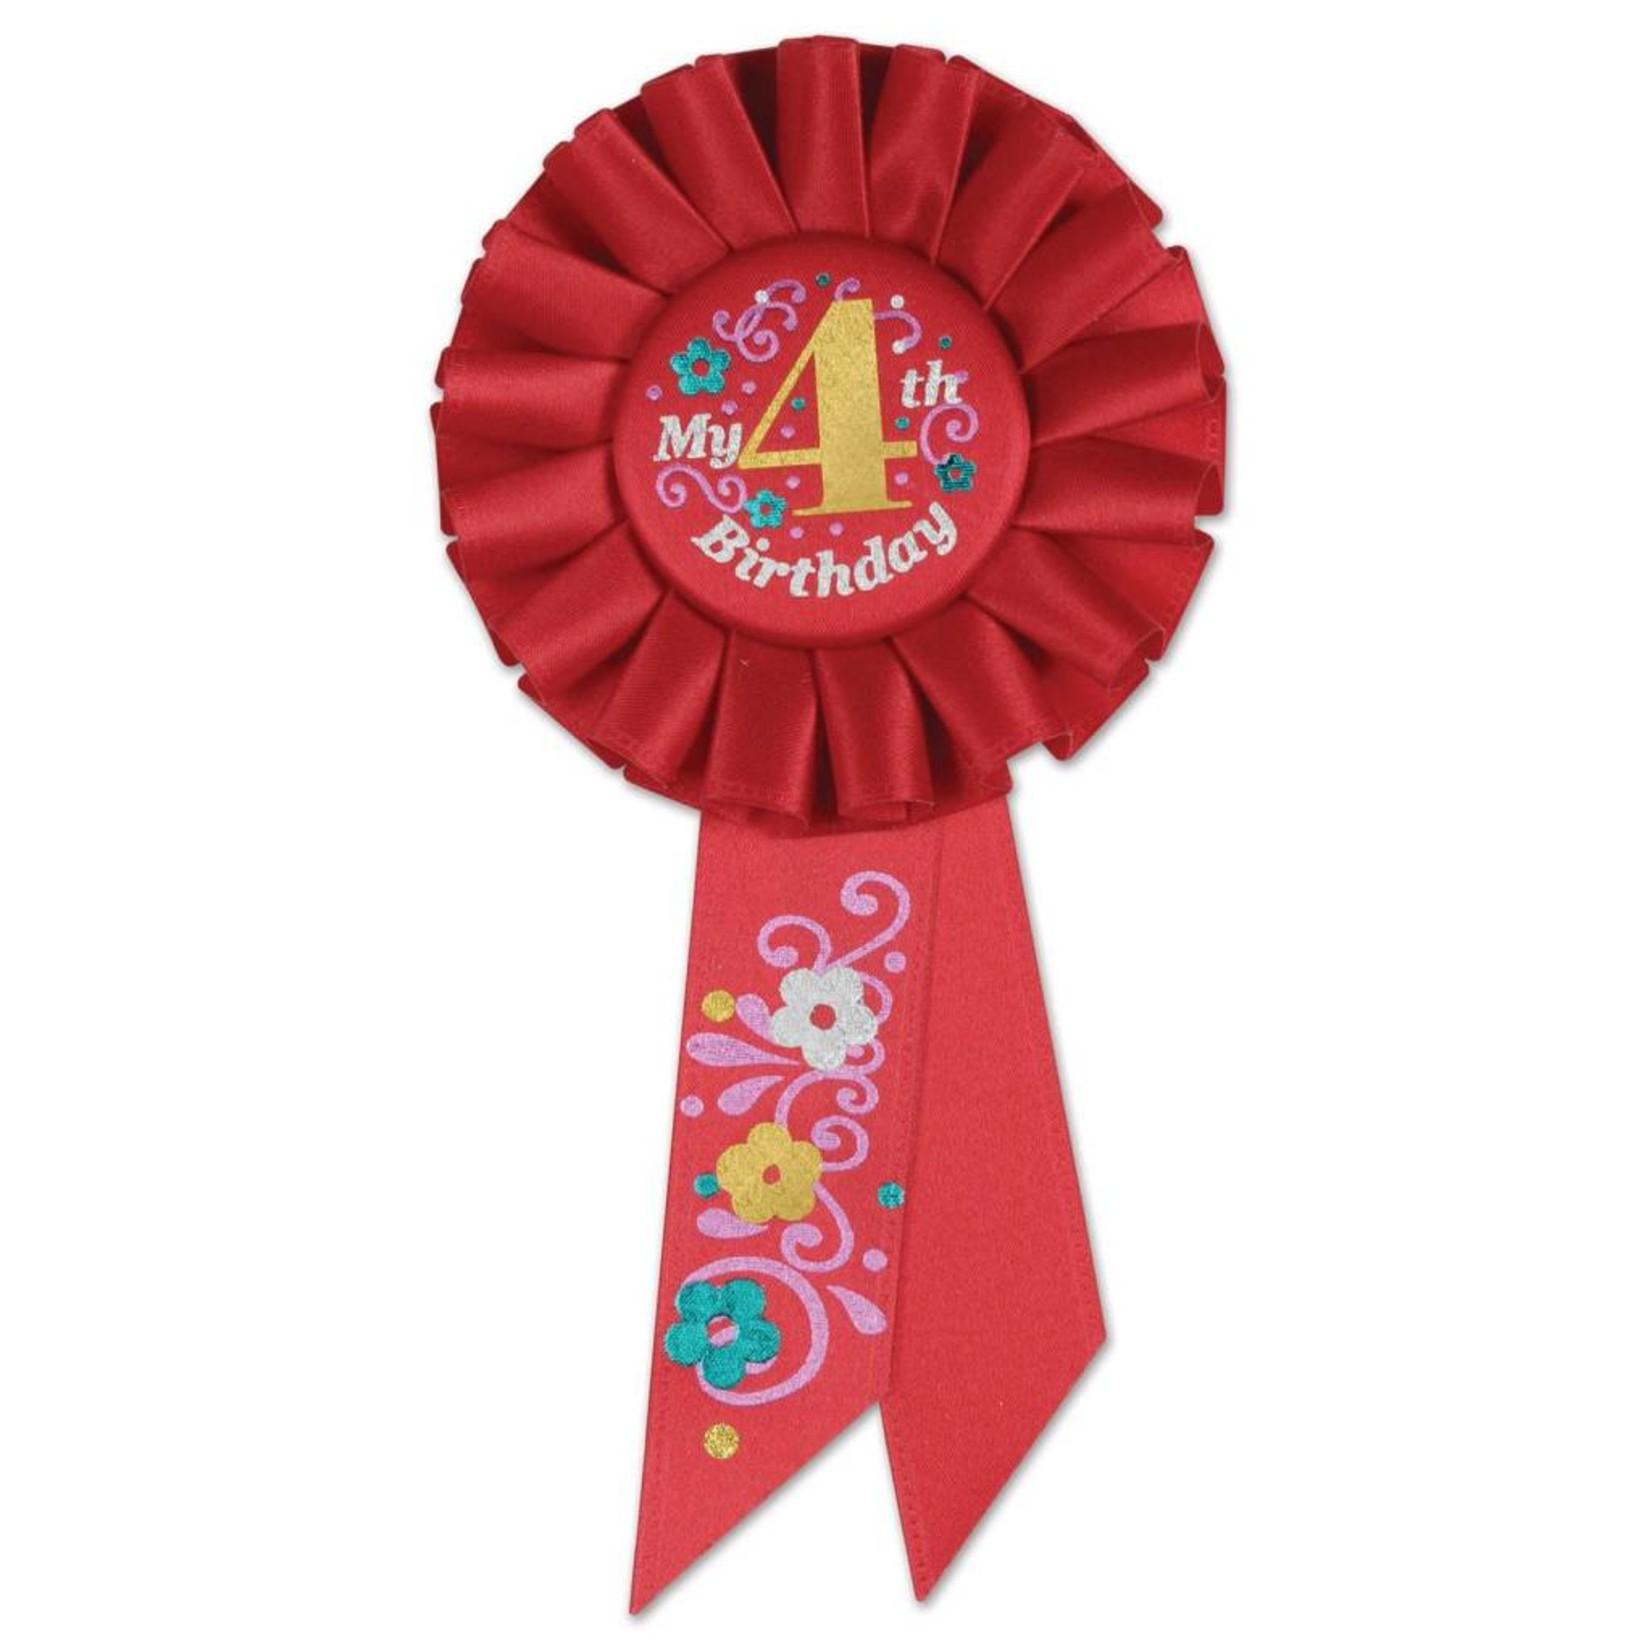 Award Ribbon- My 4th Birthday- Rosette